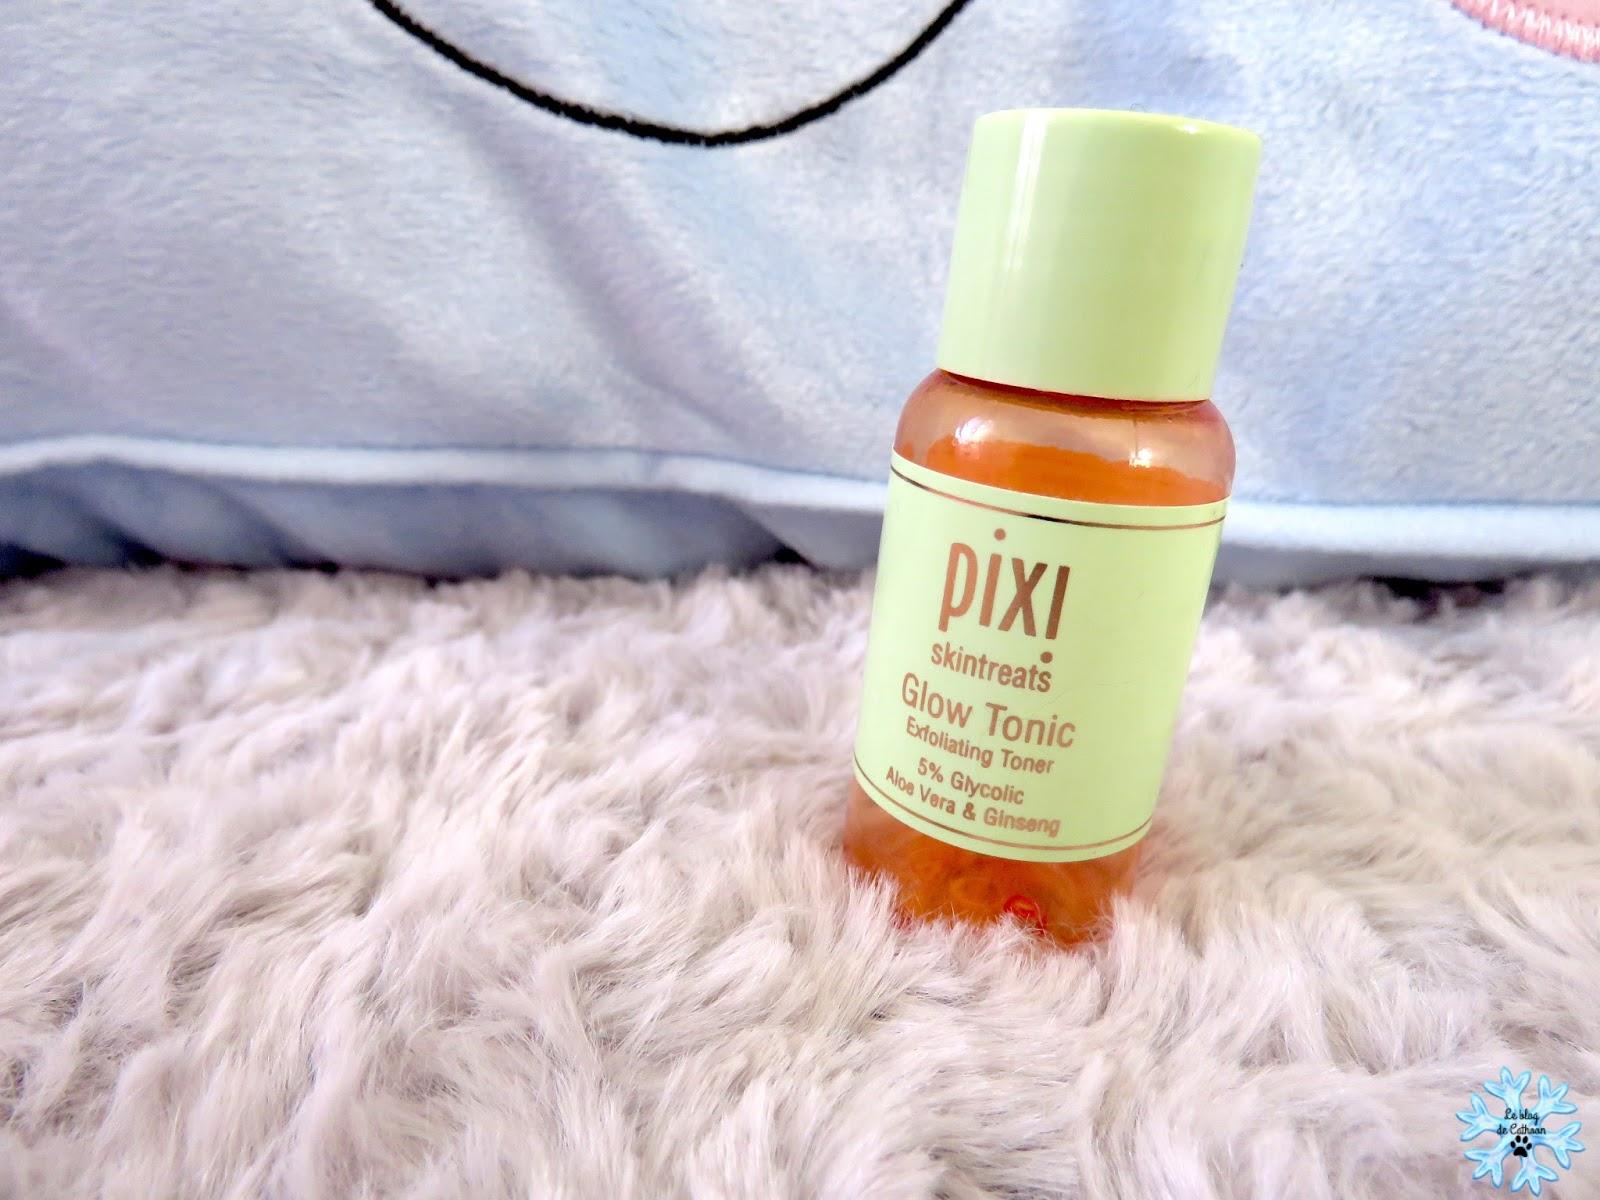 Glow Tonic - Exfoliating Toner - Pixi Skintreats